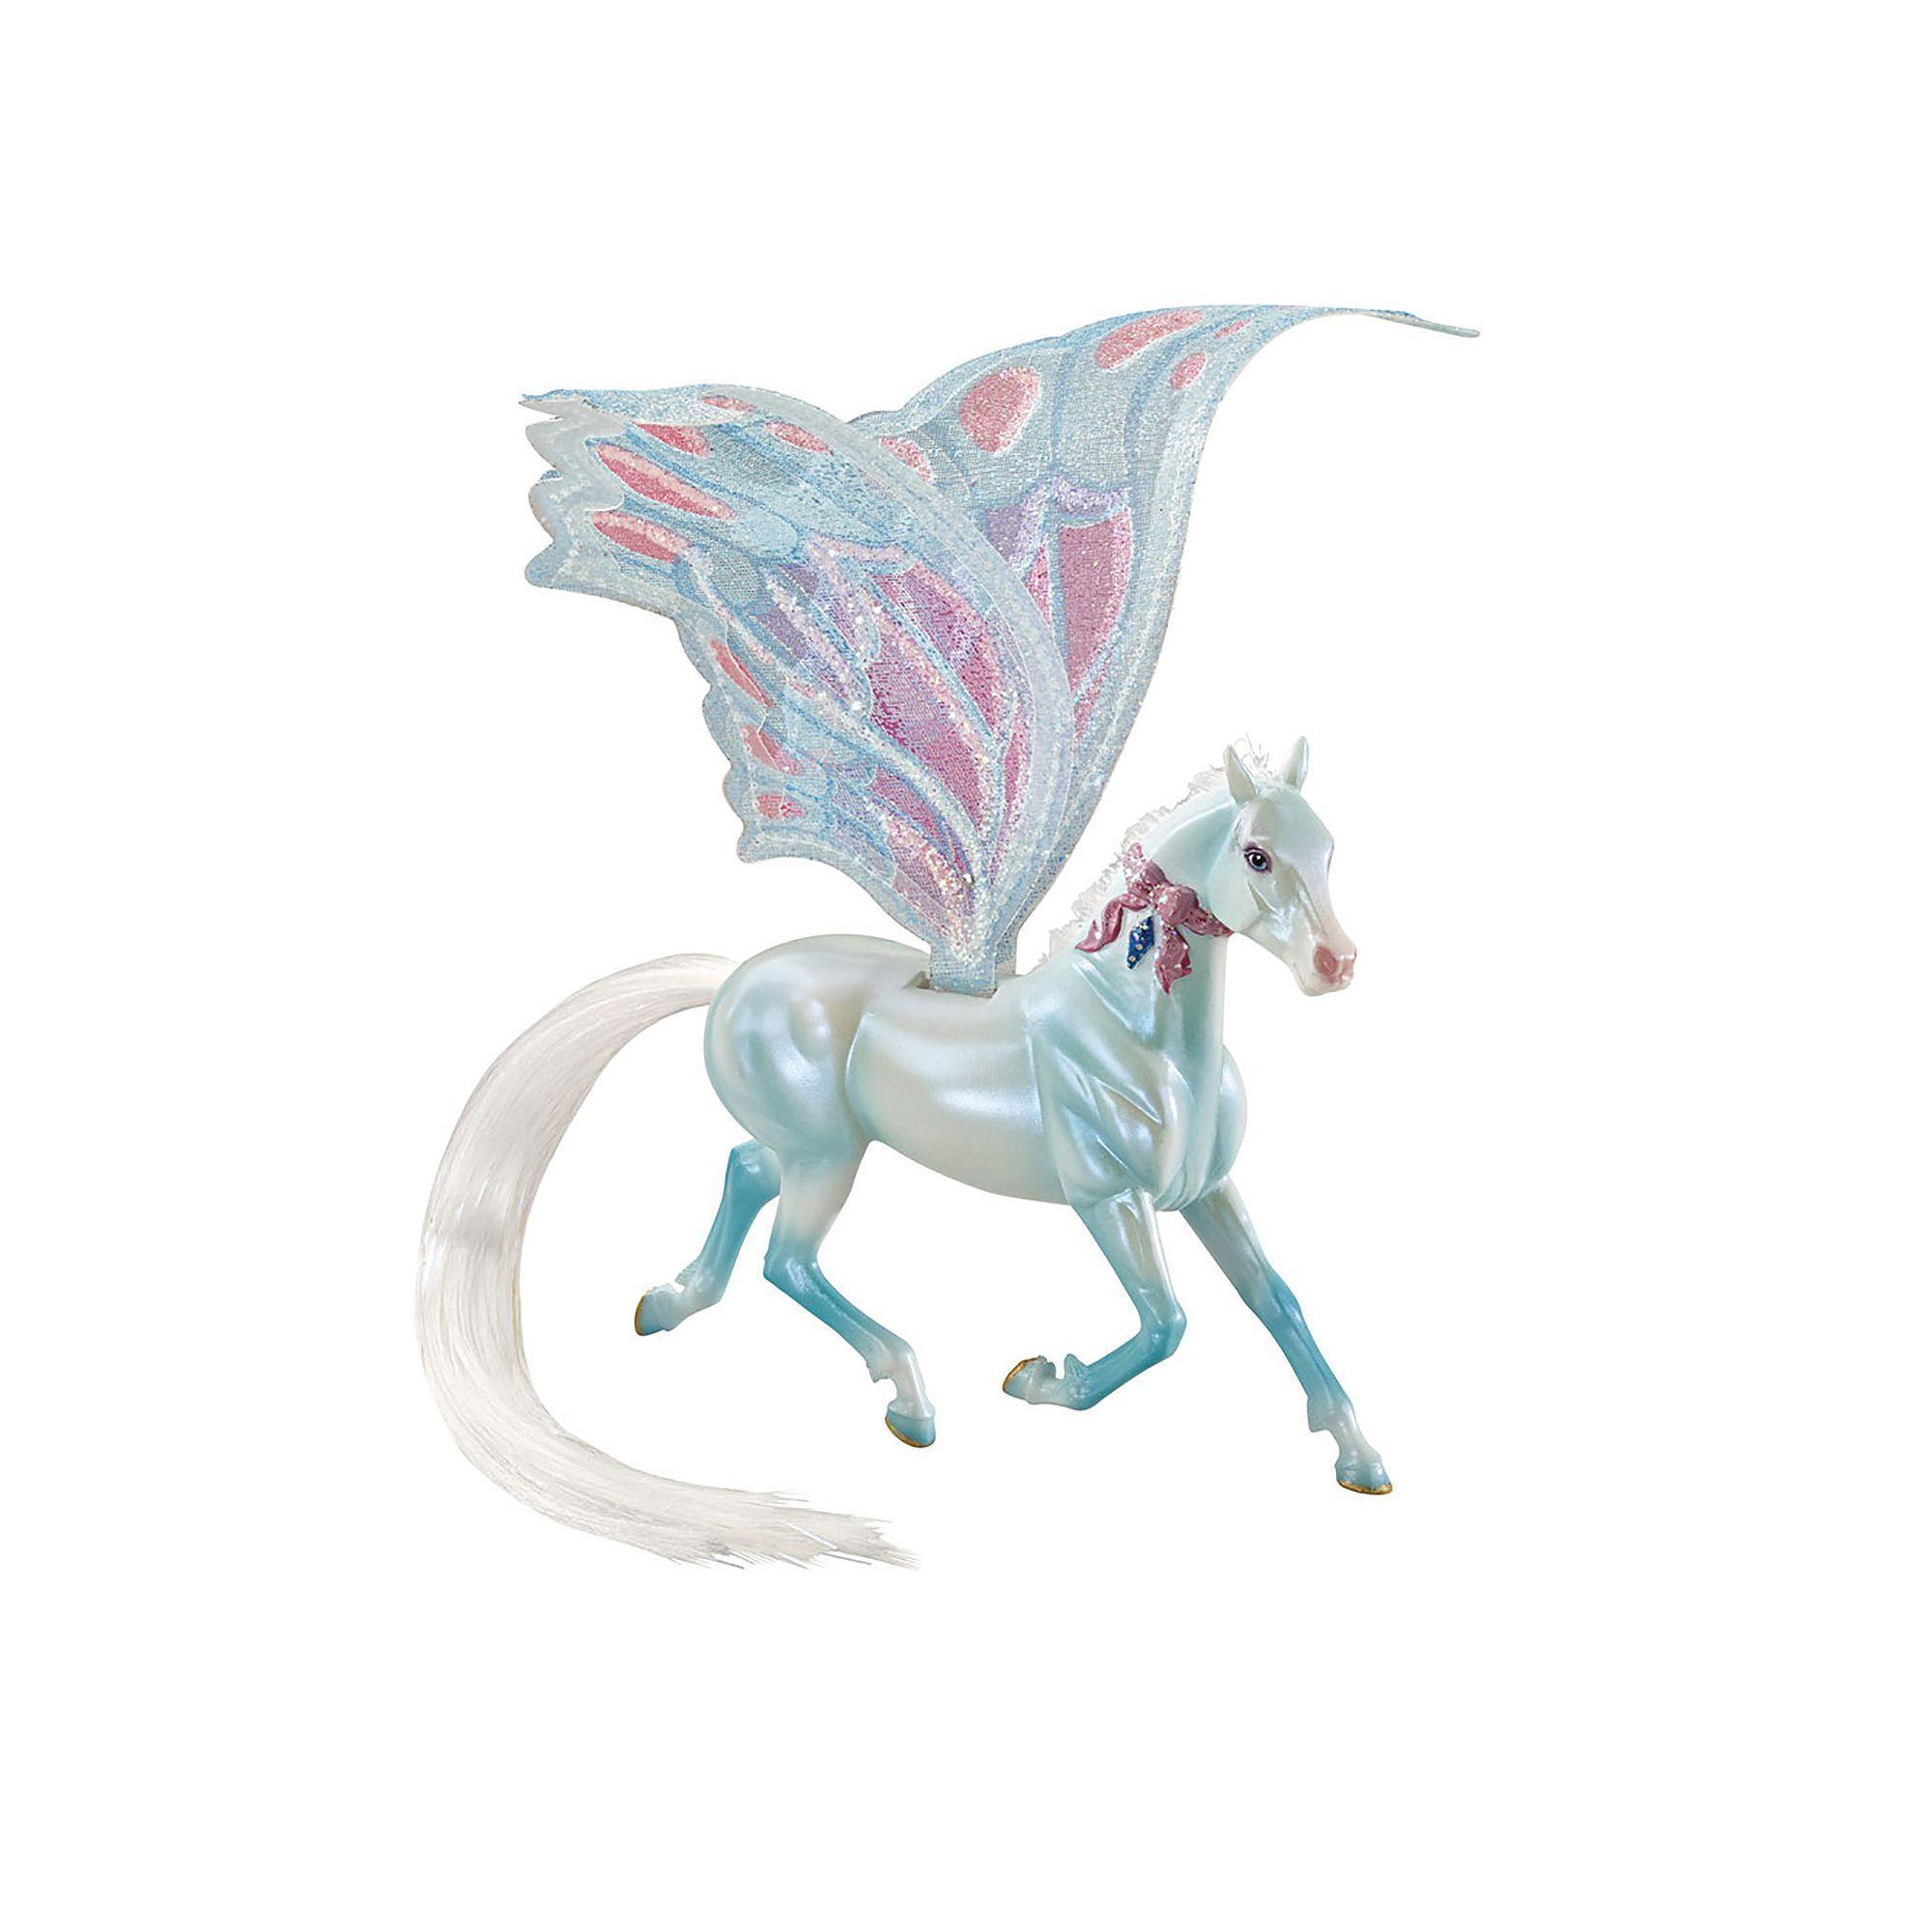 Breyer Aura Wind Dancer Horse, Multicolor